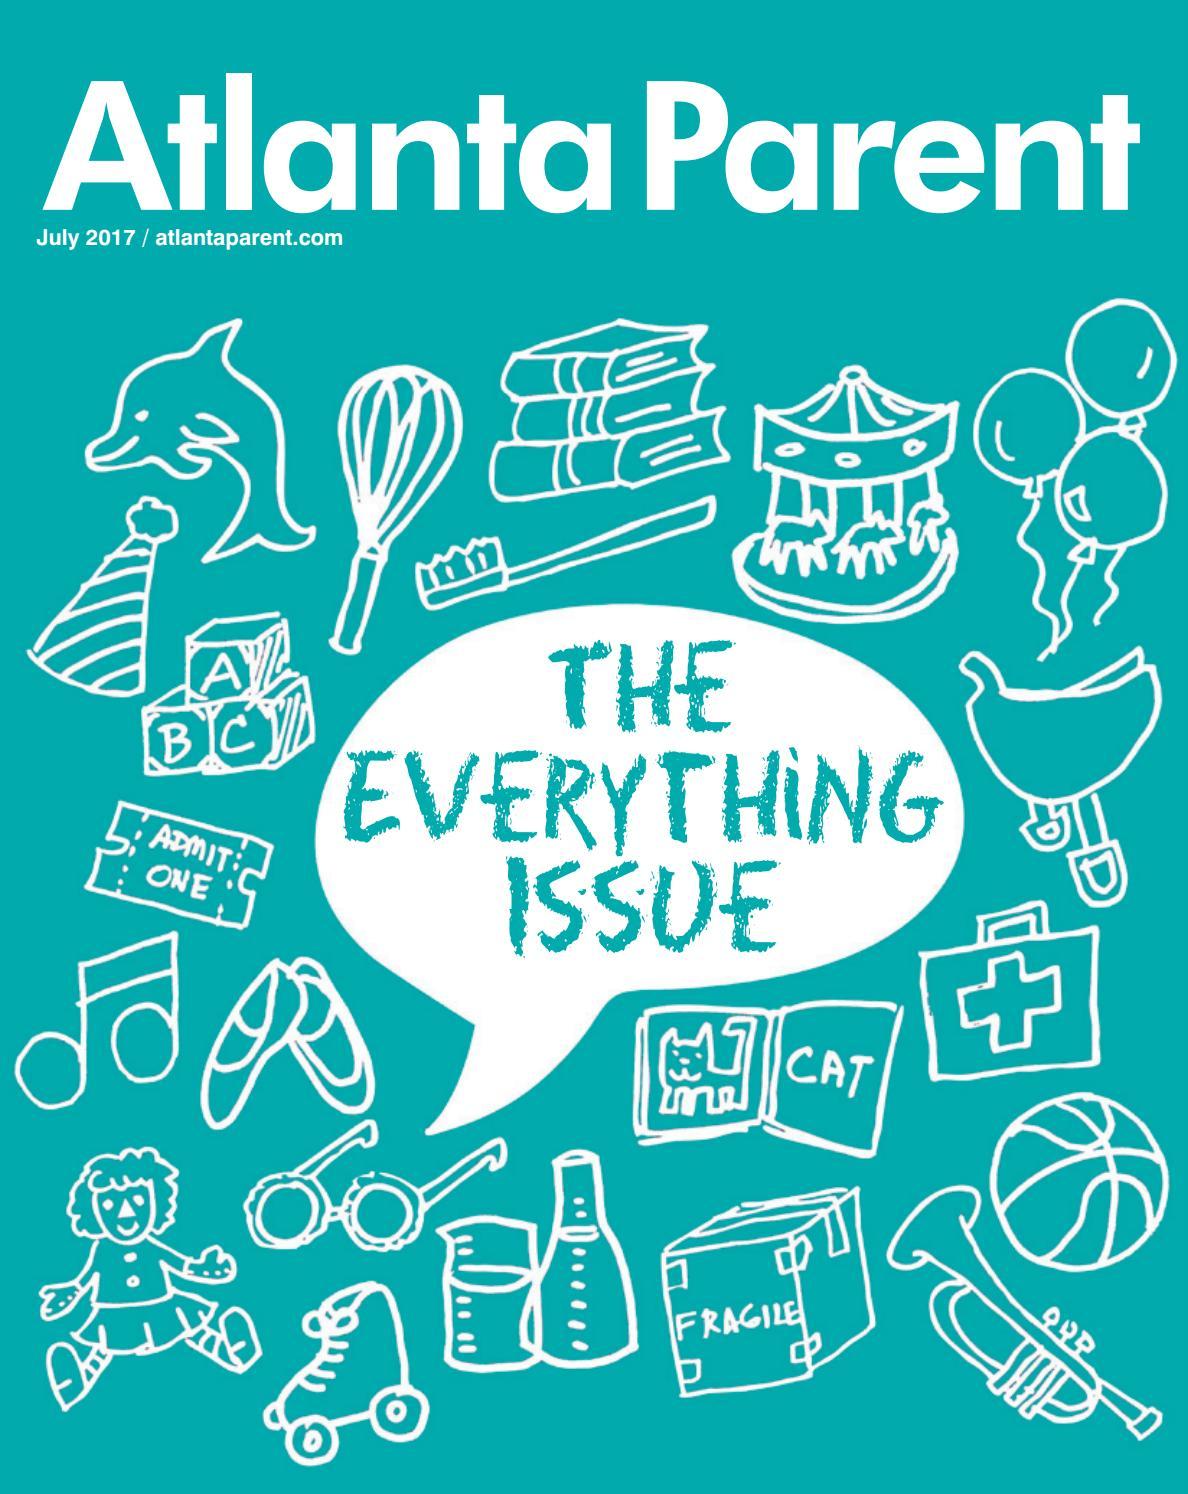 Atlanta Parent July 2017 by Atlanta Parent - issuu